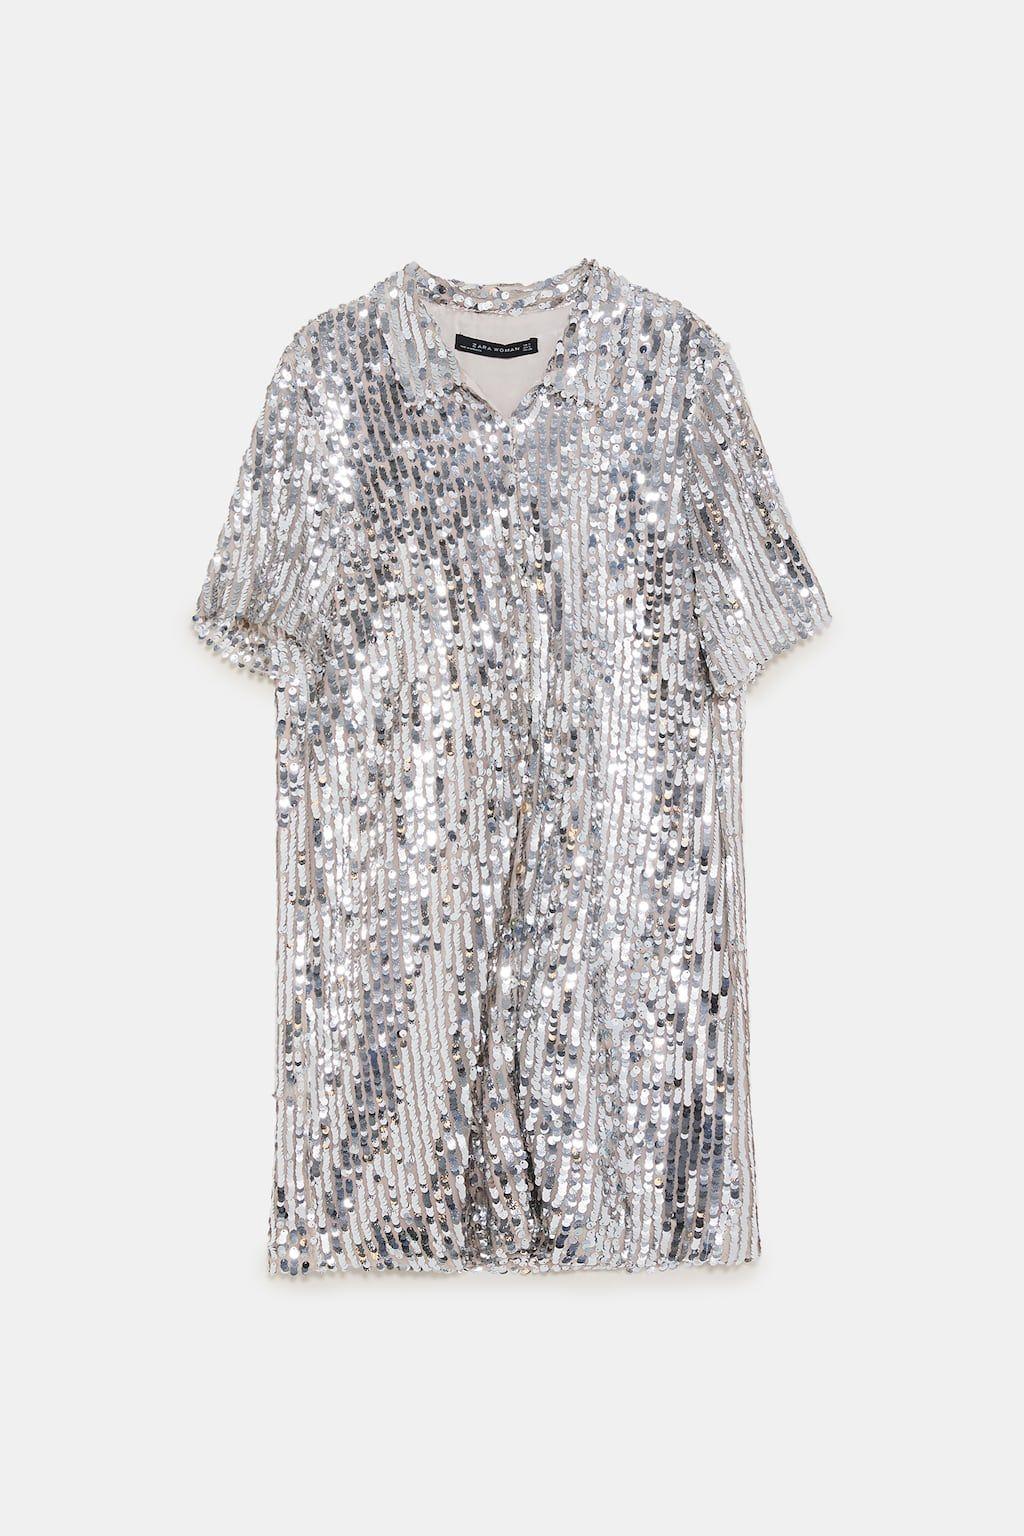 Zdjecie 6 Koszulowa Sukienka Z Cekinami Z Zara Vestido Camisero Vestido Lentejuelas Vestidos Camiseros